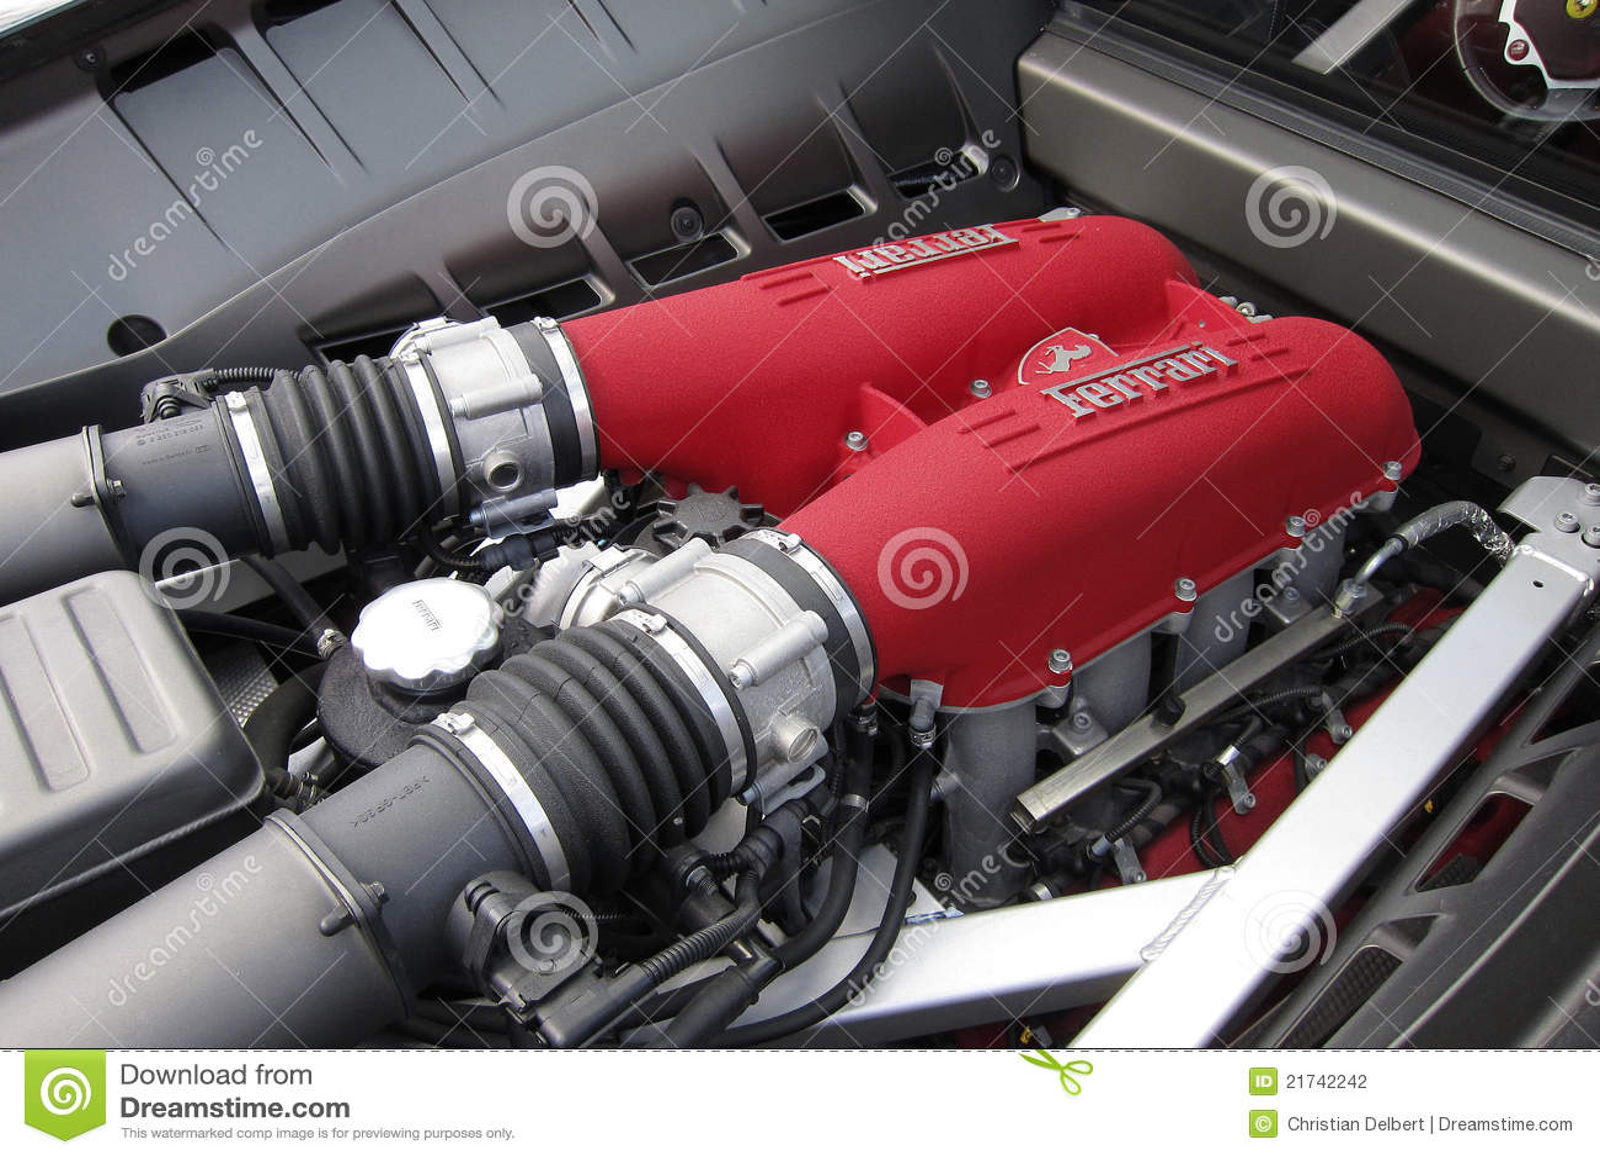 Ferrari 458 Engine Editorial Photography Image Of Turbo